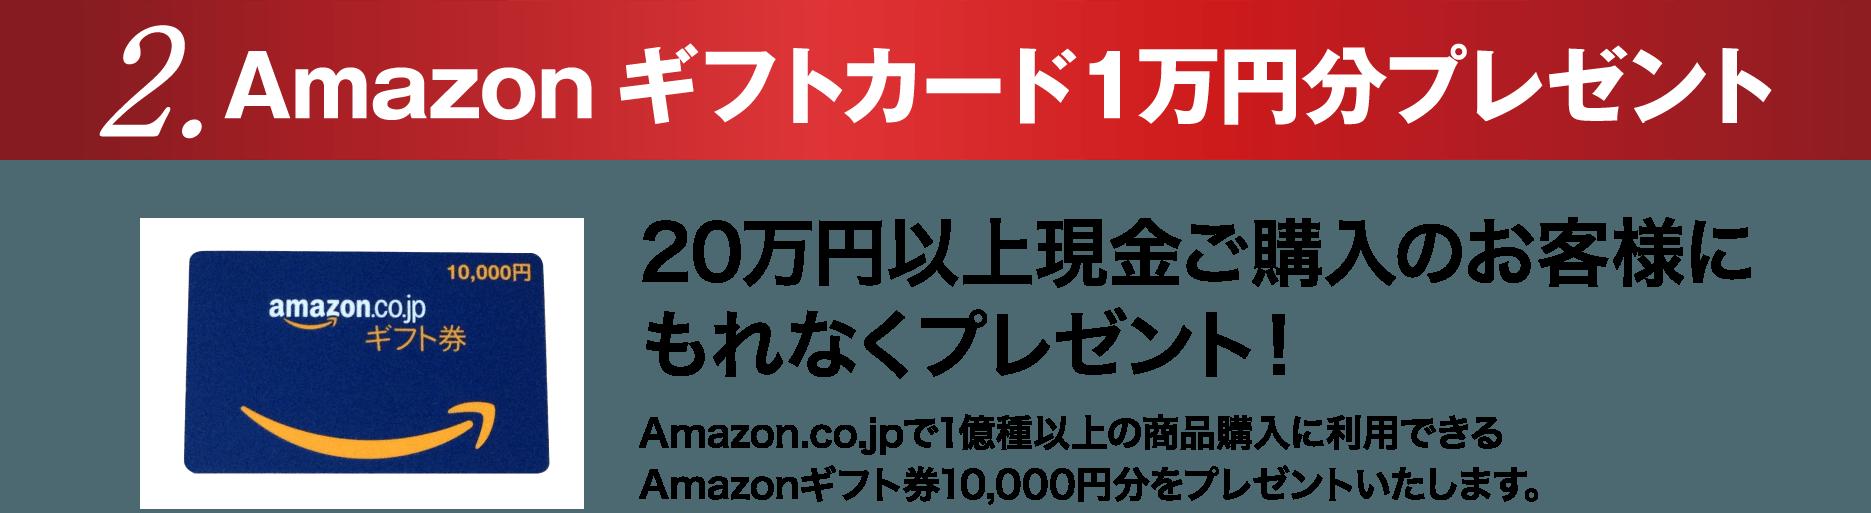 2. Amazon ギフトカード1万円分プレゼント